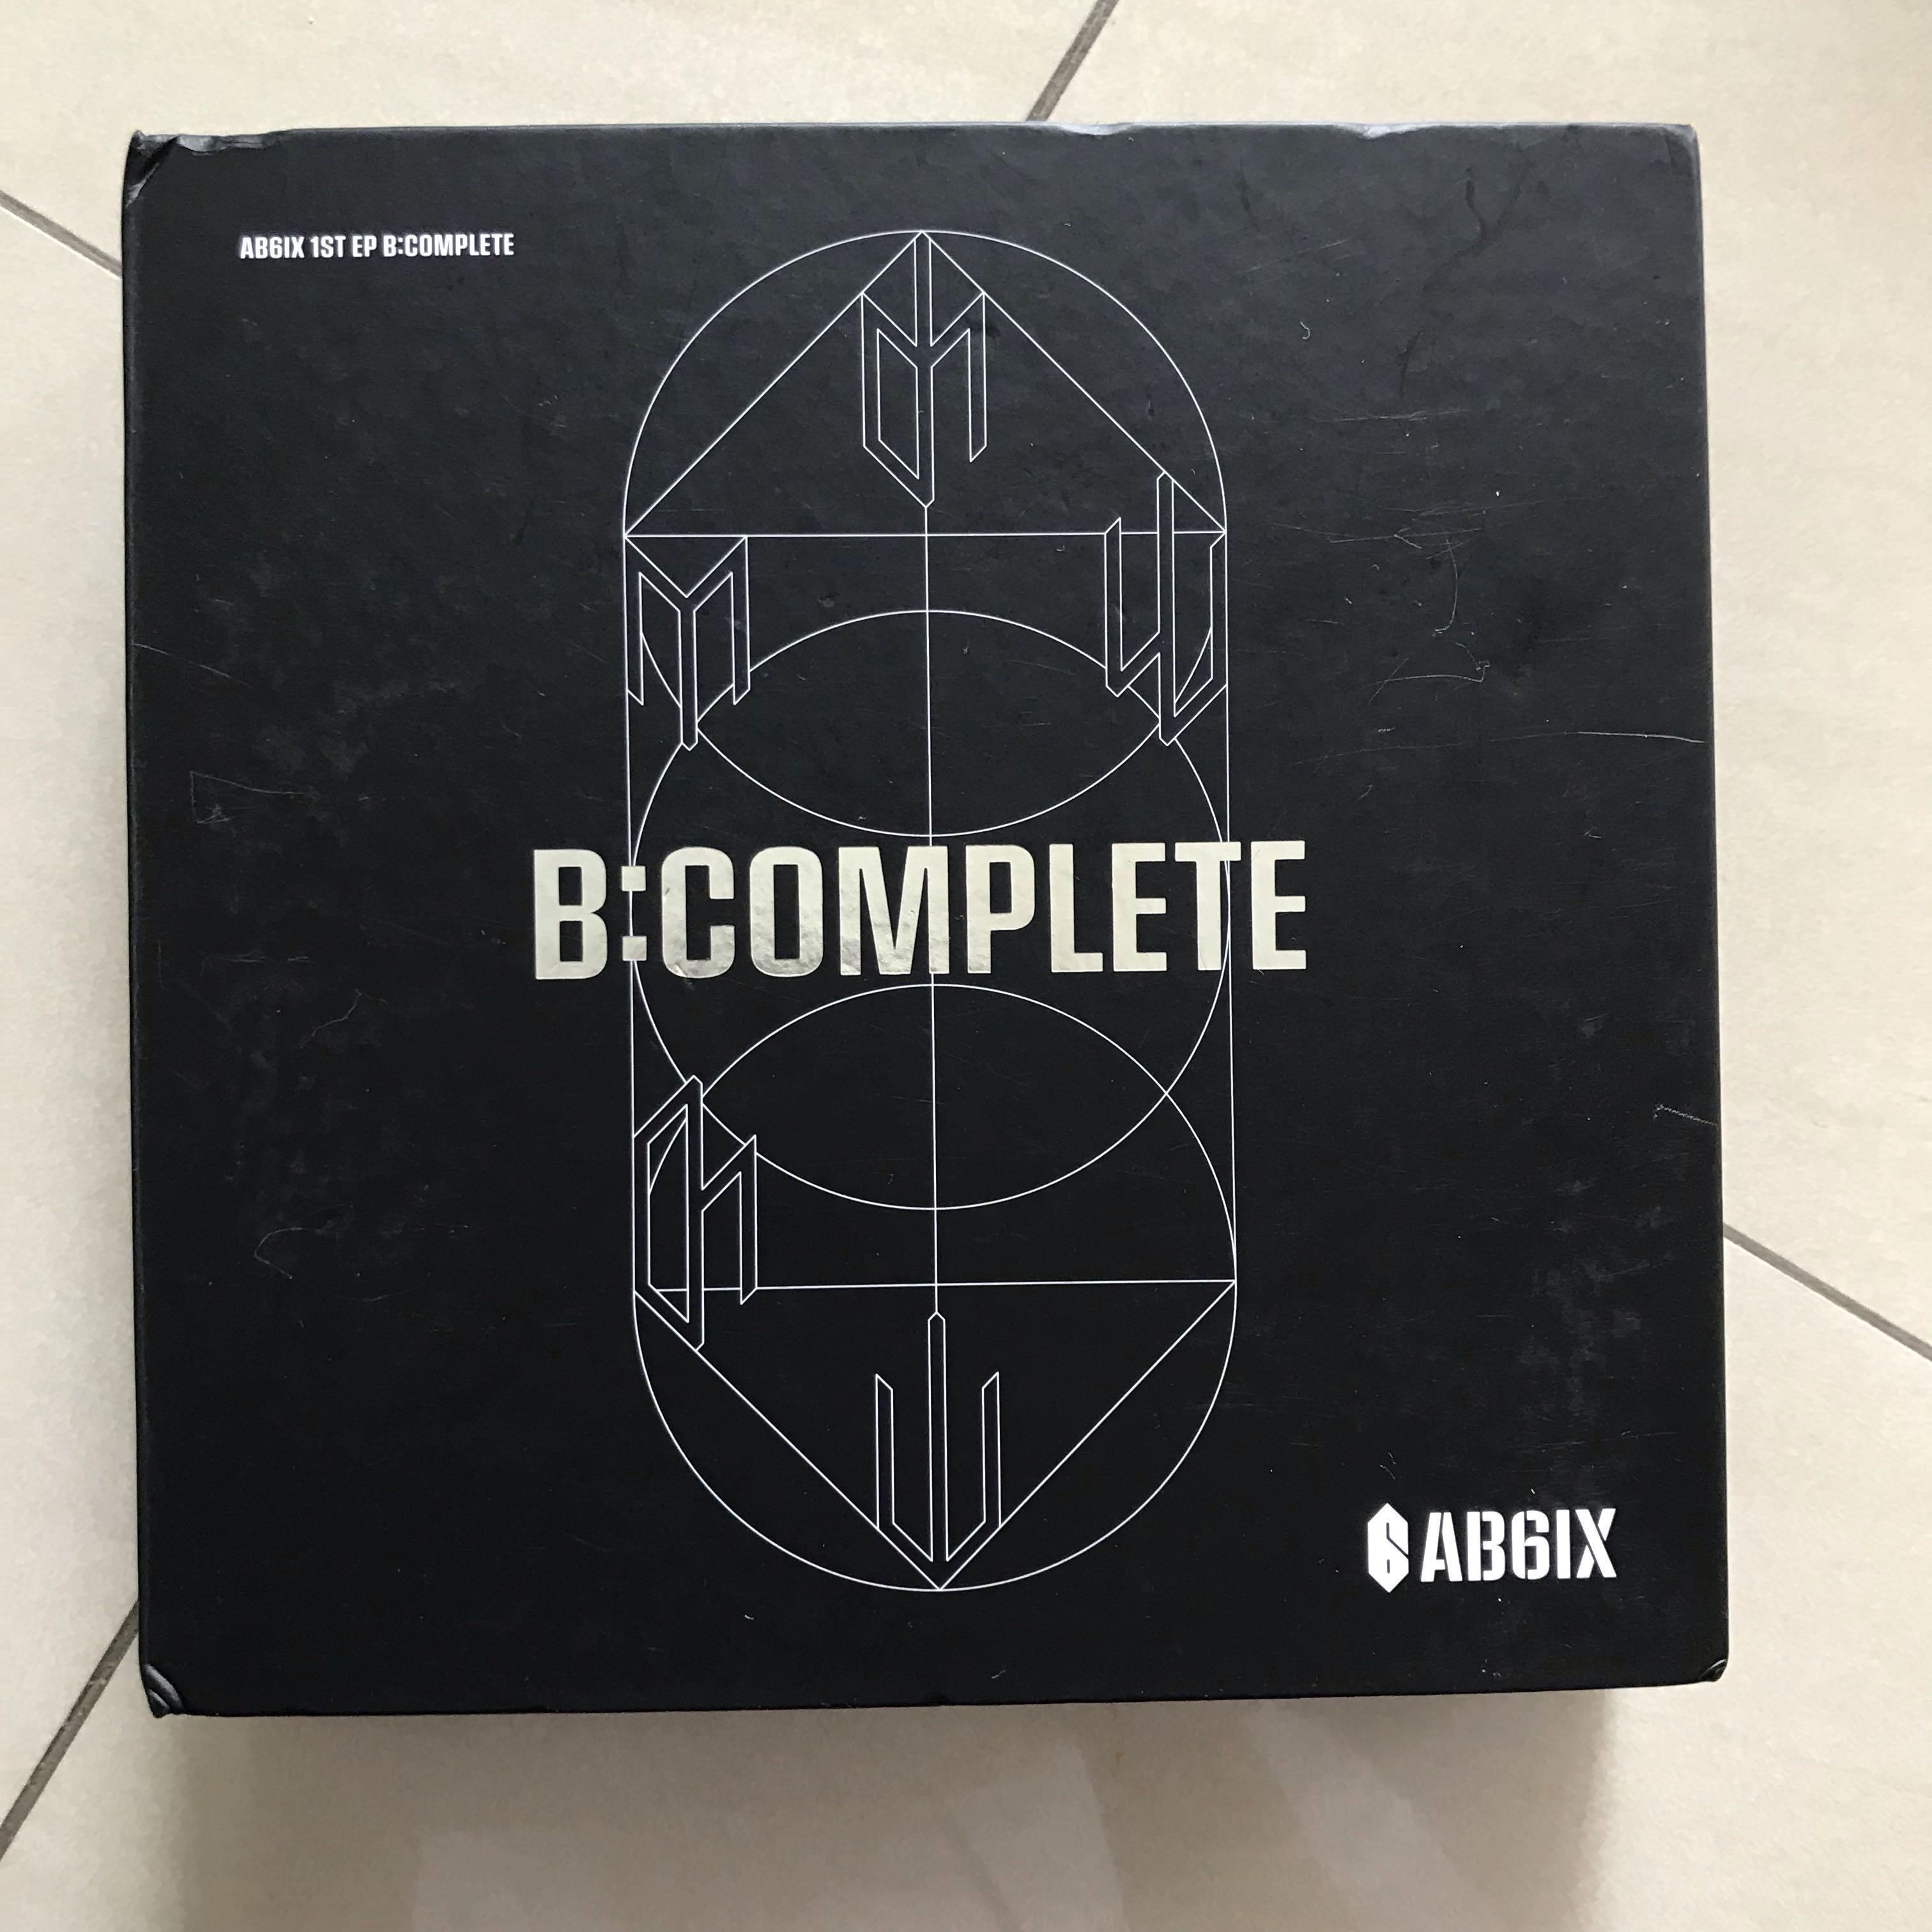 wts ab6ix b complete album